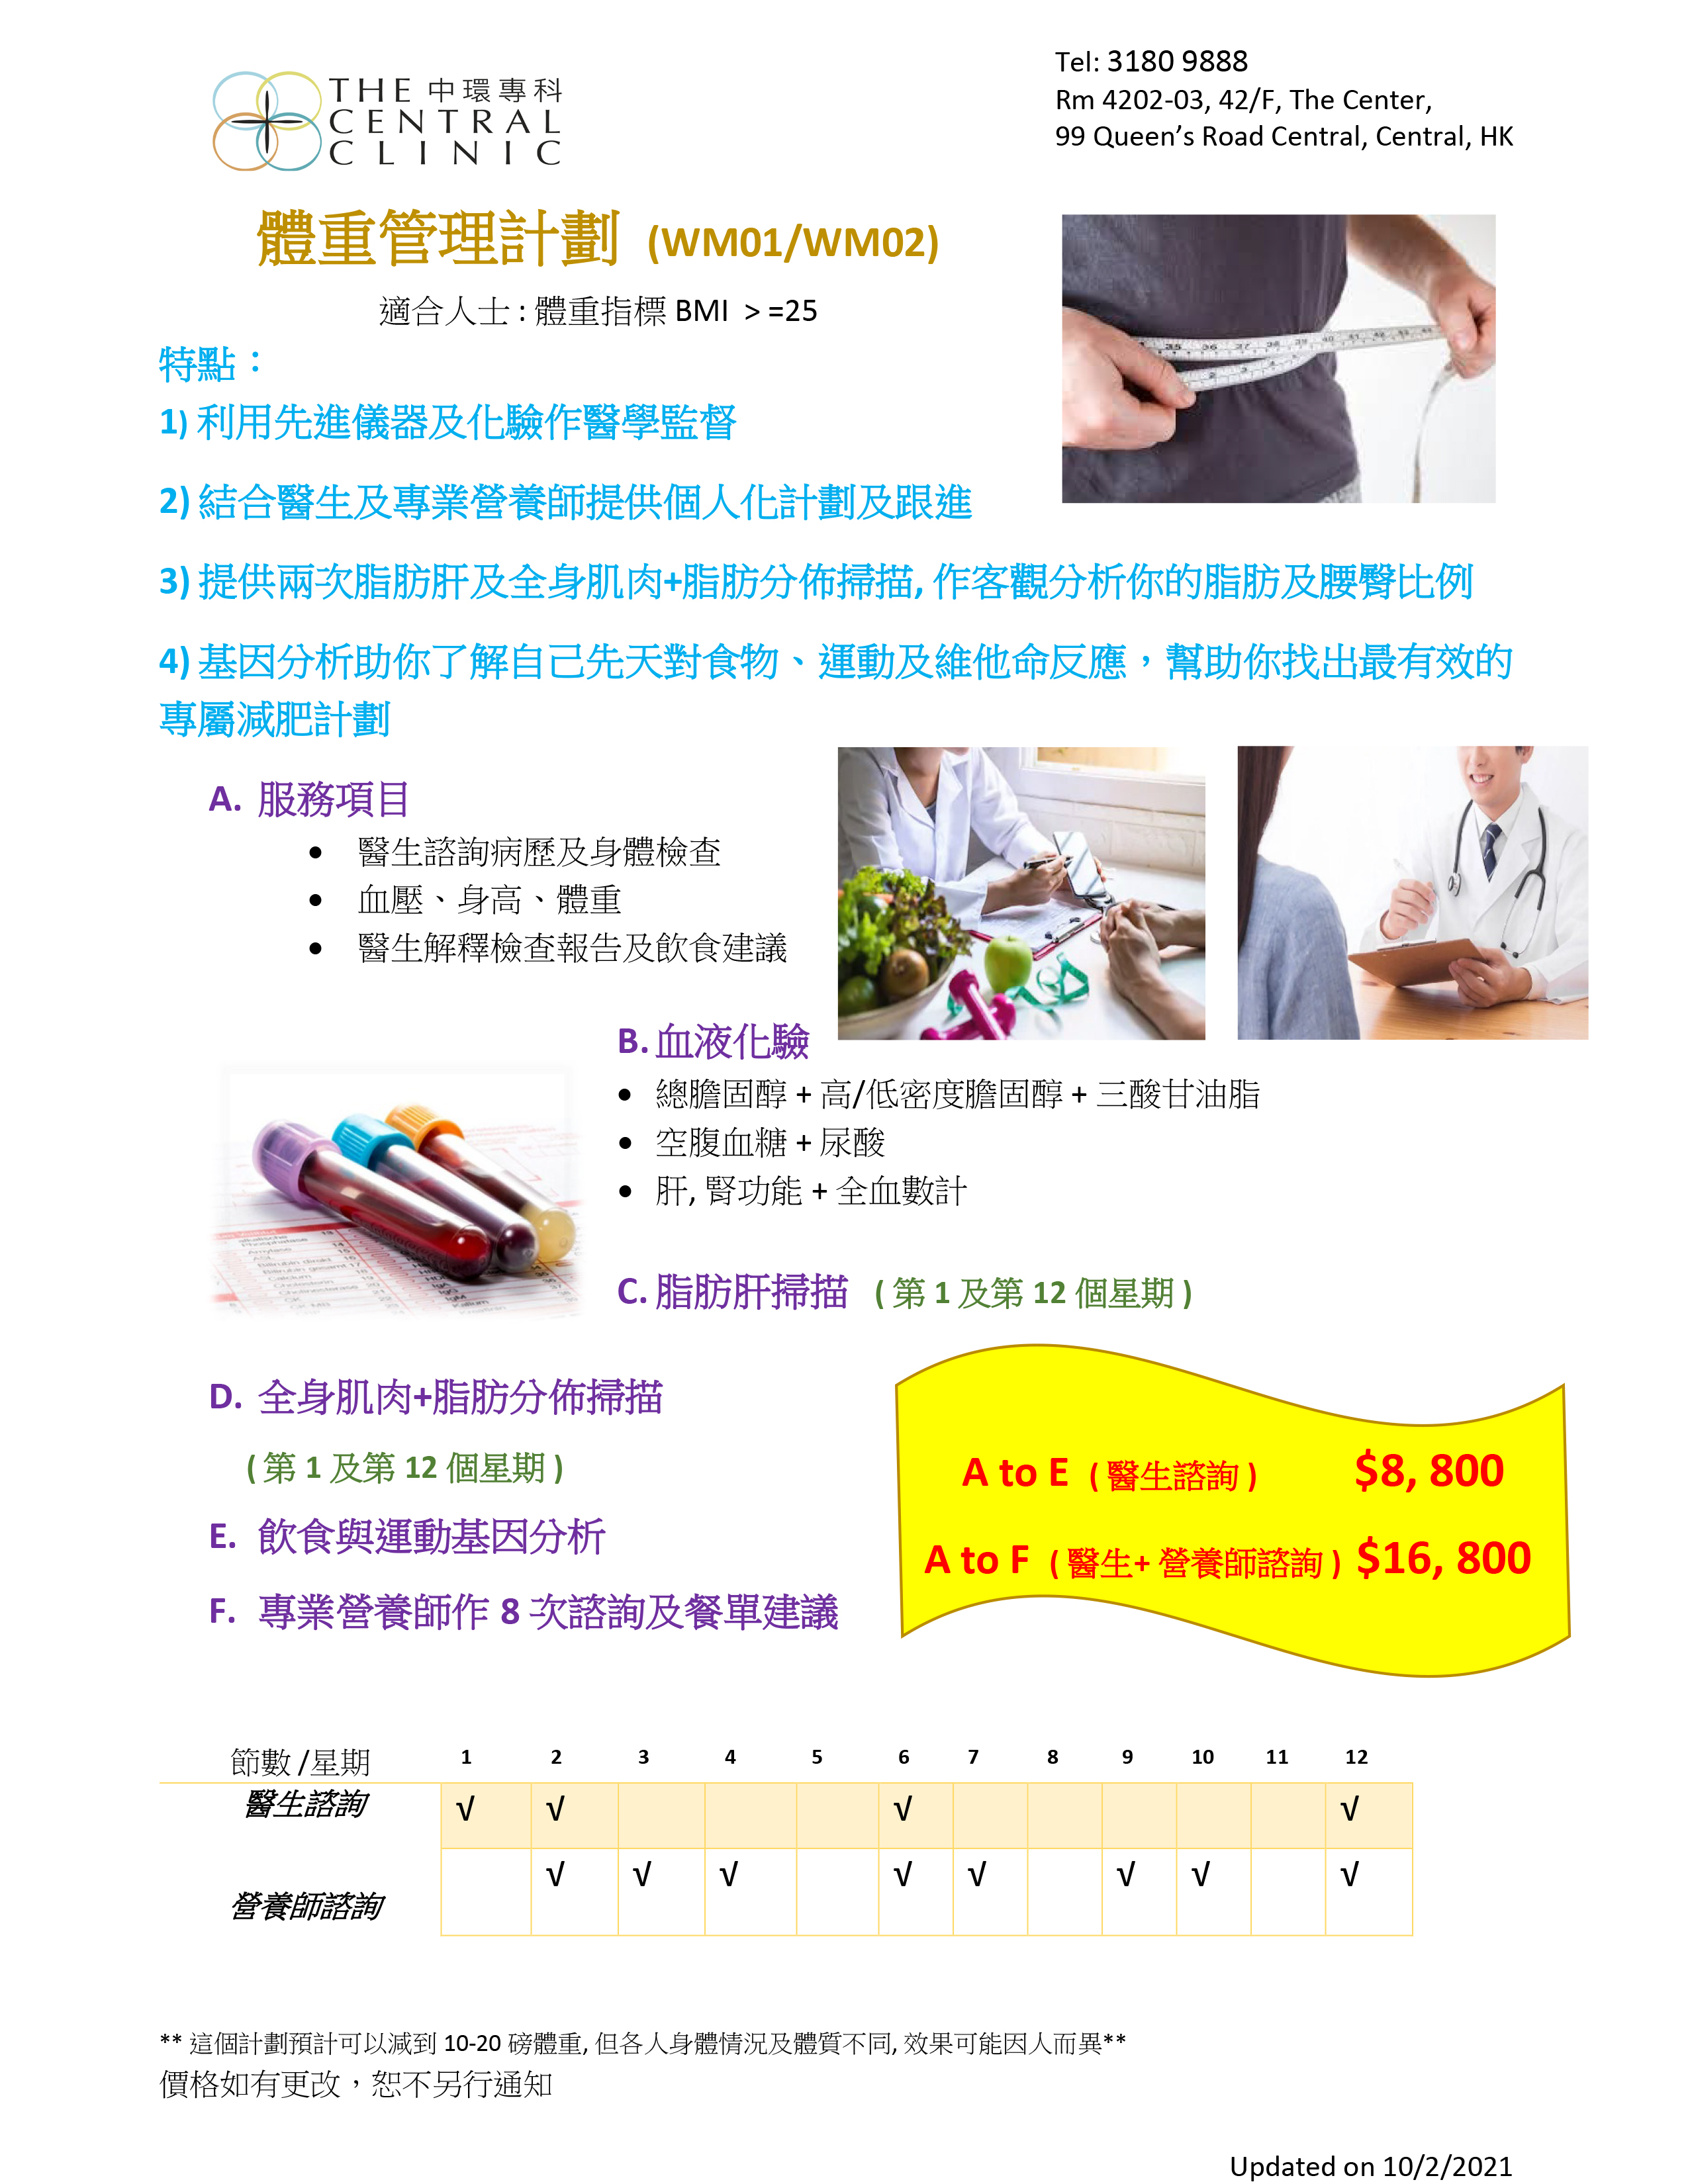 TCC - 體重管理計劃 第一頁